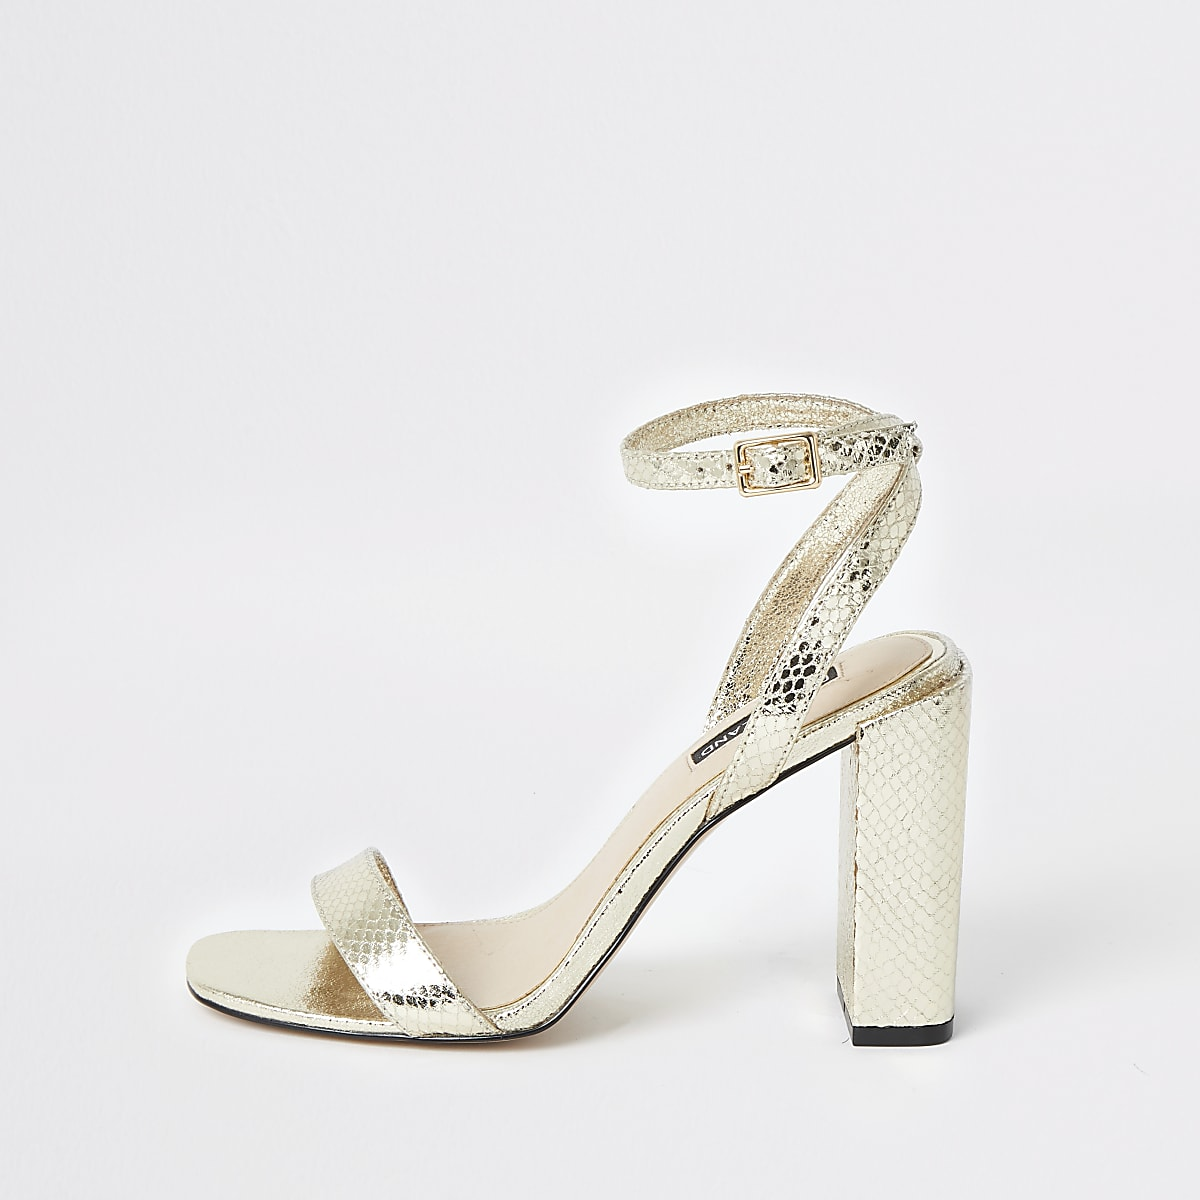 b624b59513b87 Gold metallic two part block heel sandals - Sandals - Shoes & Boots - women